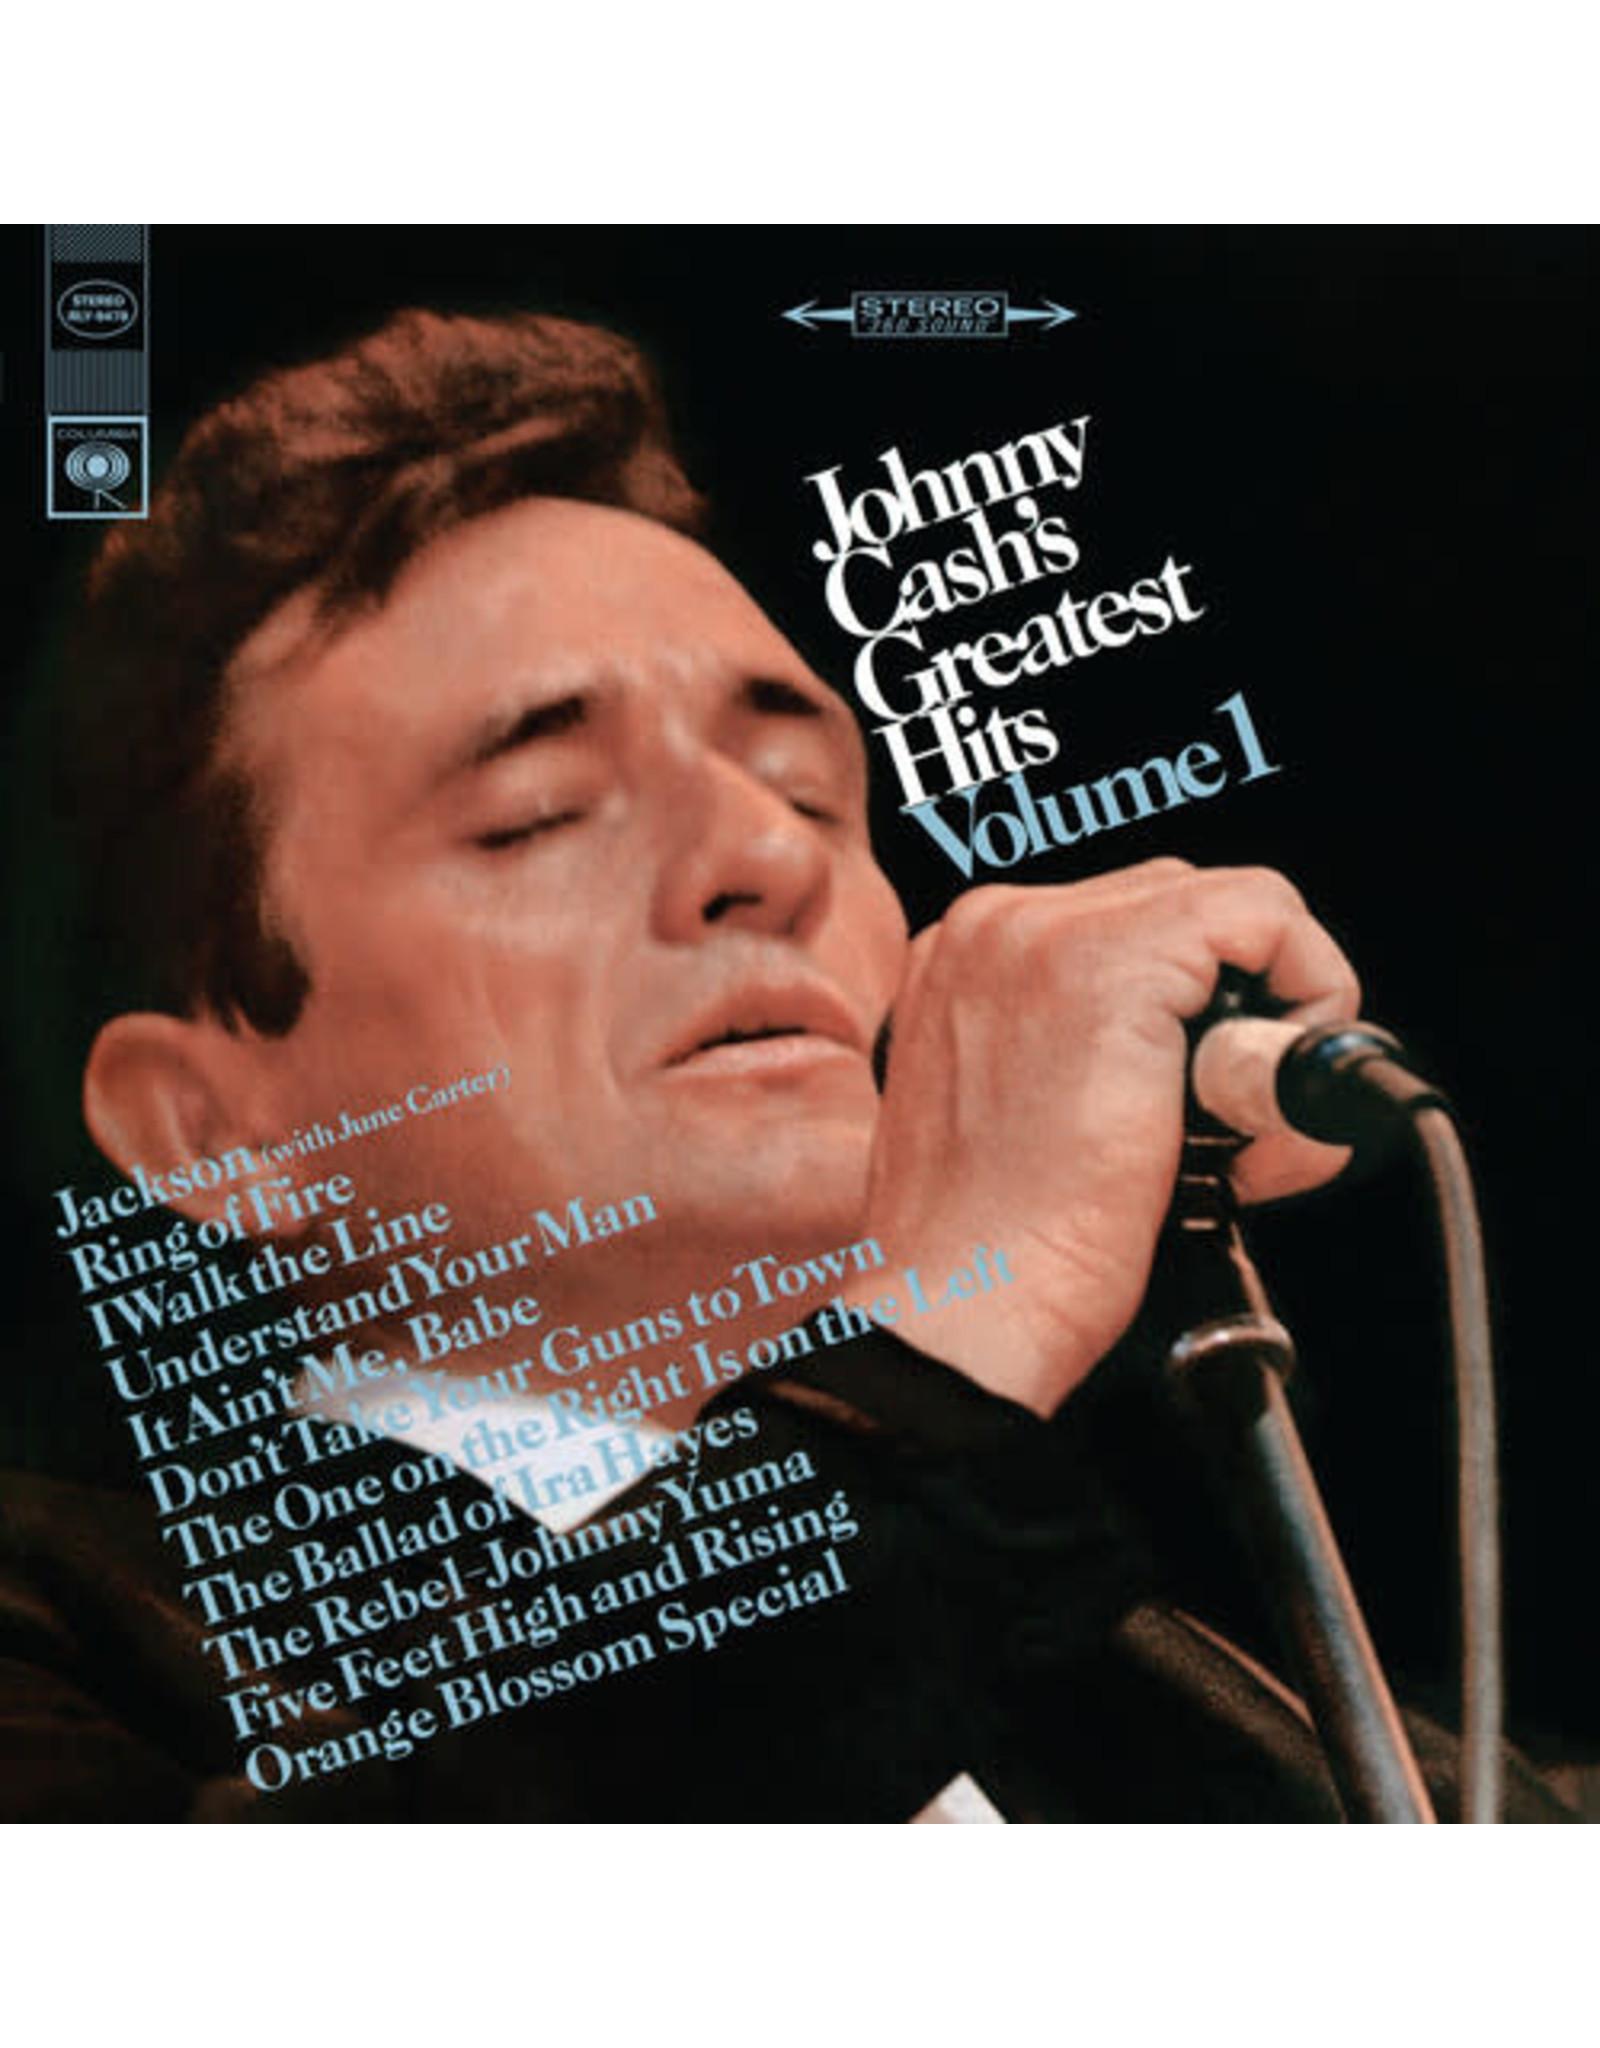 New Vinyl Johnny Cash - Greatest Hits Vol. 1 LP